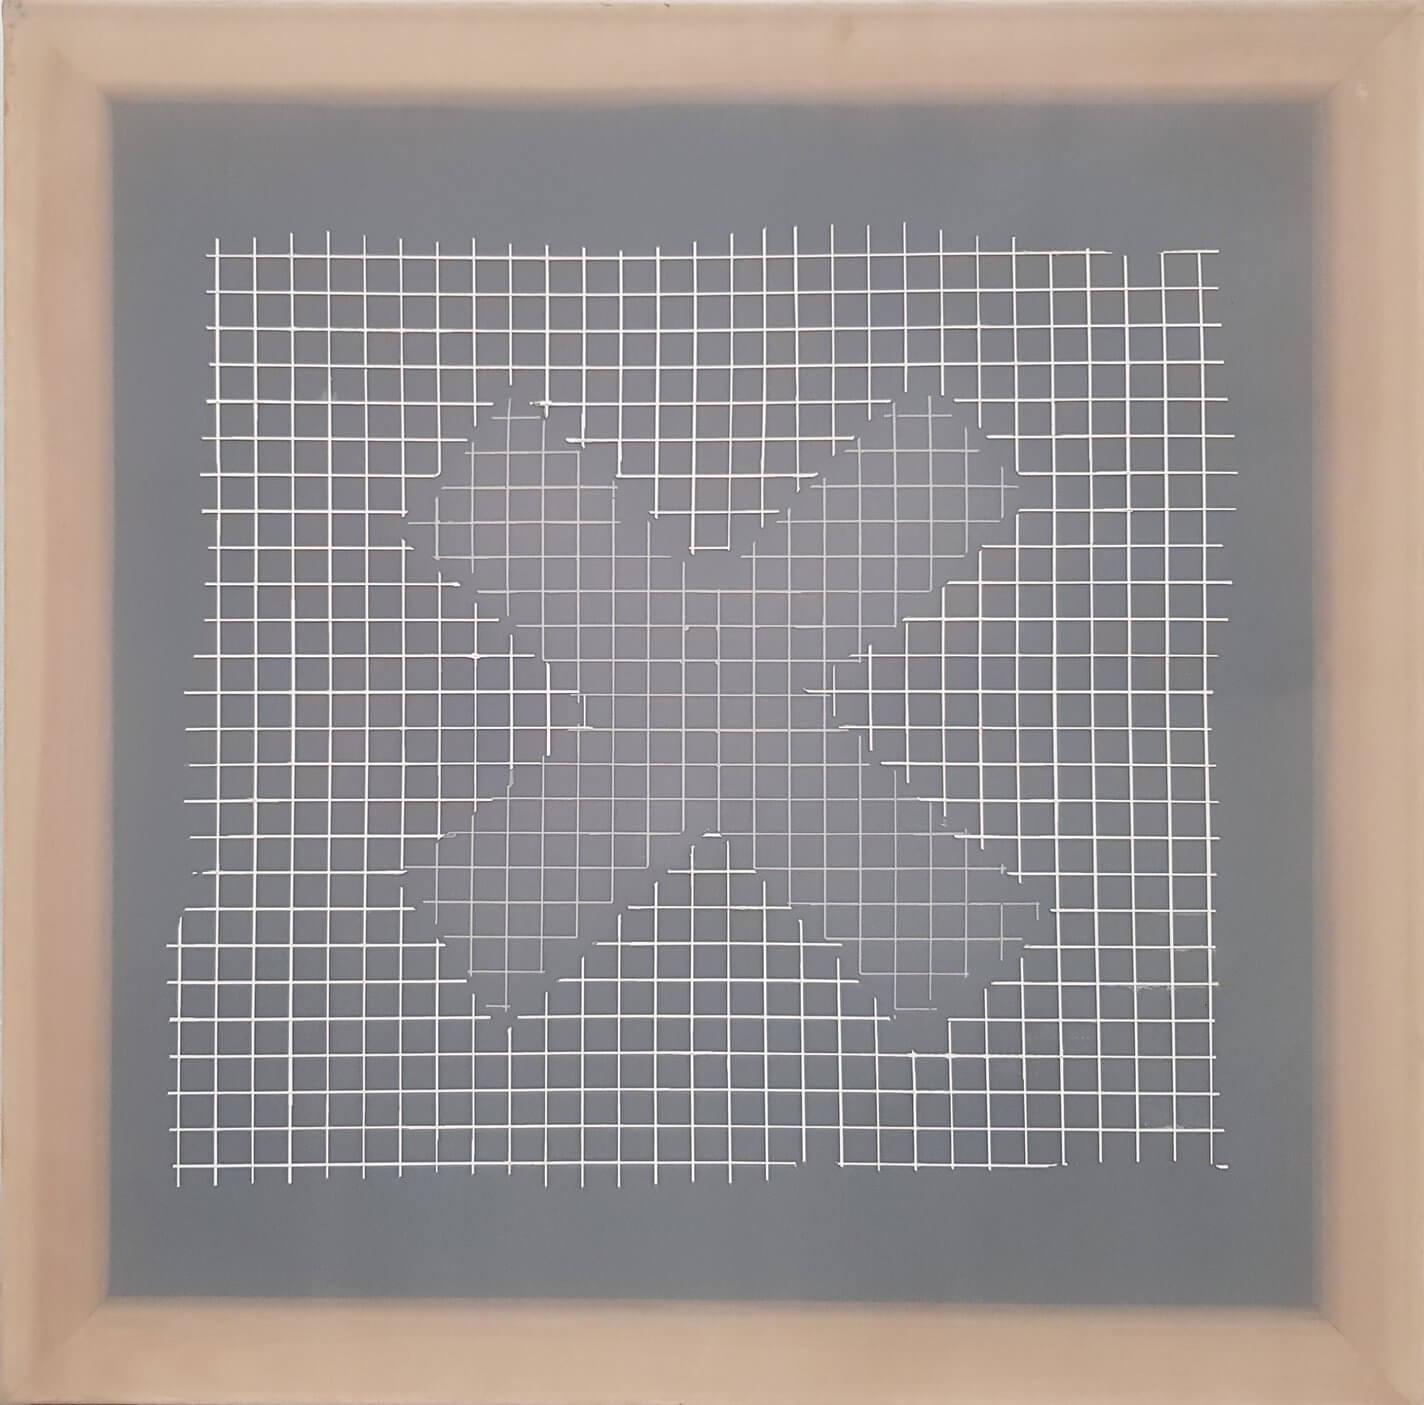 1575_Benni Efrat, Double Ex, 1973, Mixed media on canvas, 50x50 cm-1424x1405 (1)